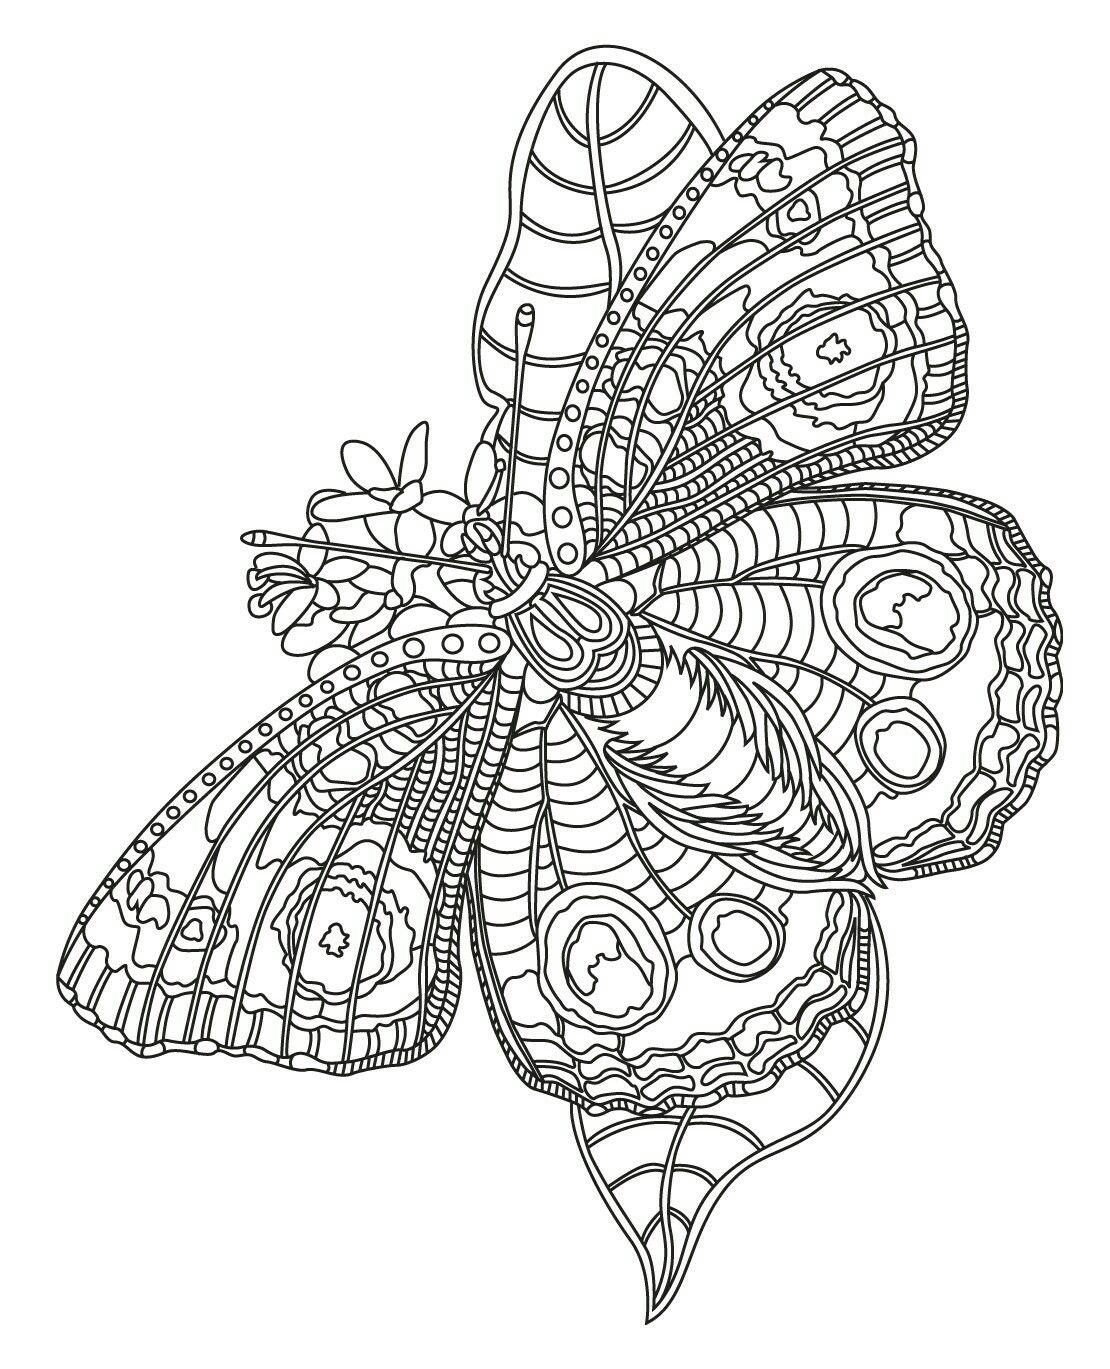 Para colorear mariposa | Coloring pages | Pinterest | Colorear ...